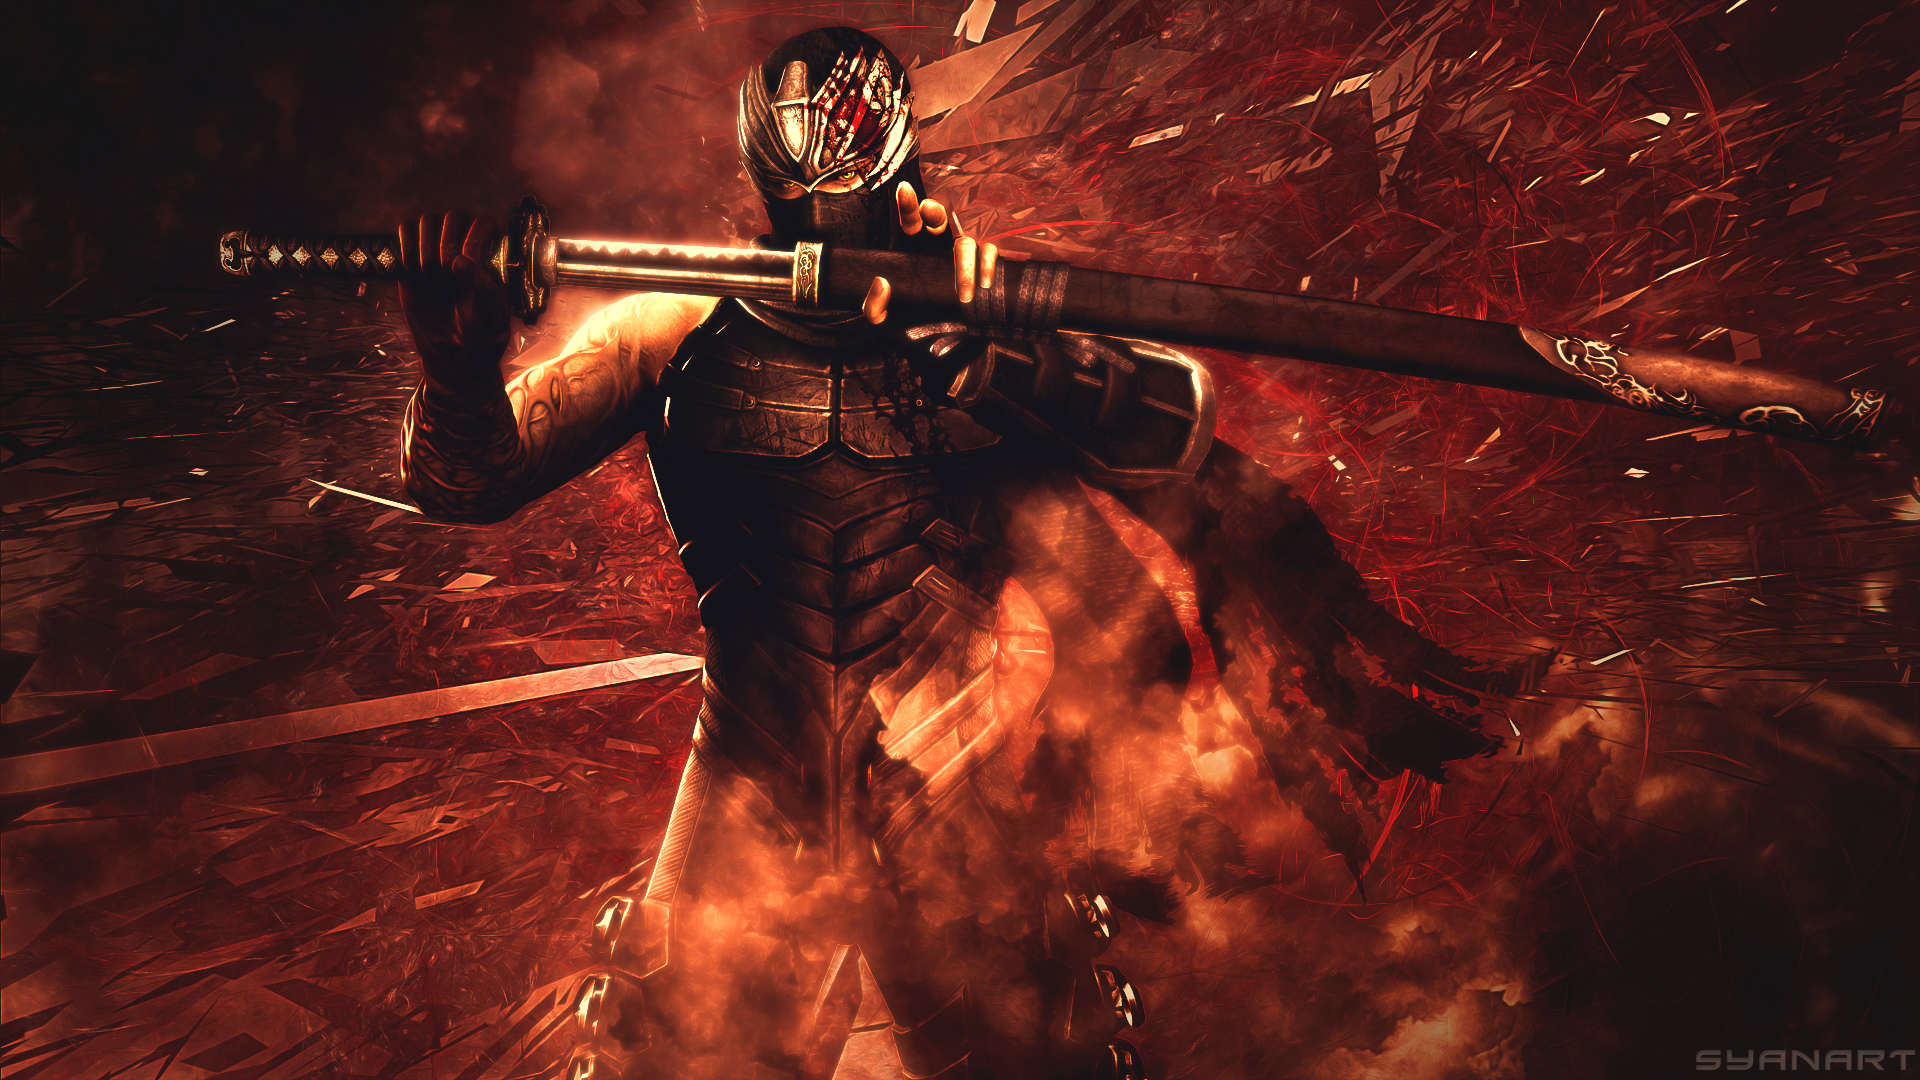 Ninja Gaiden 3 The legendary ninja Wallpaper SyanArt